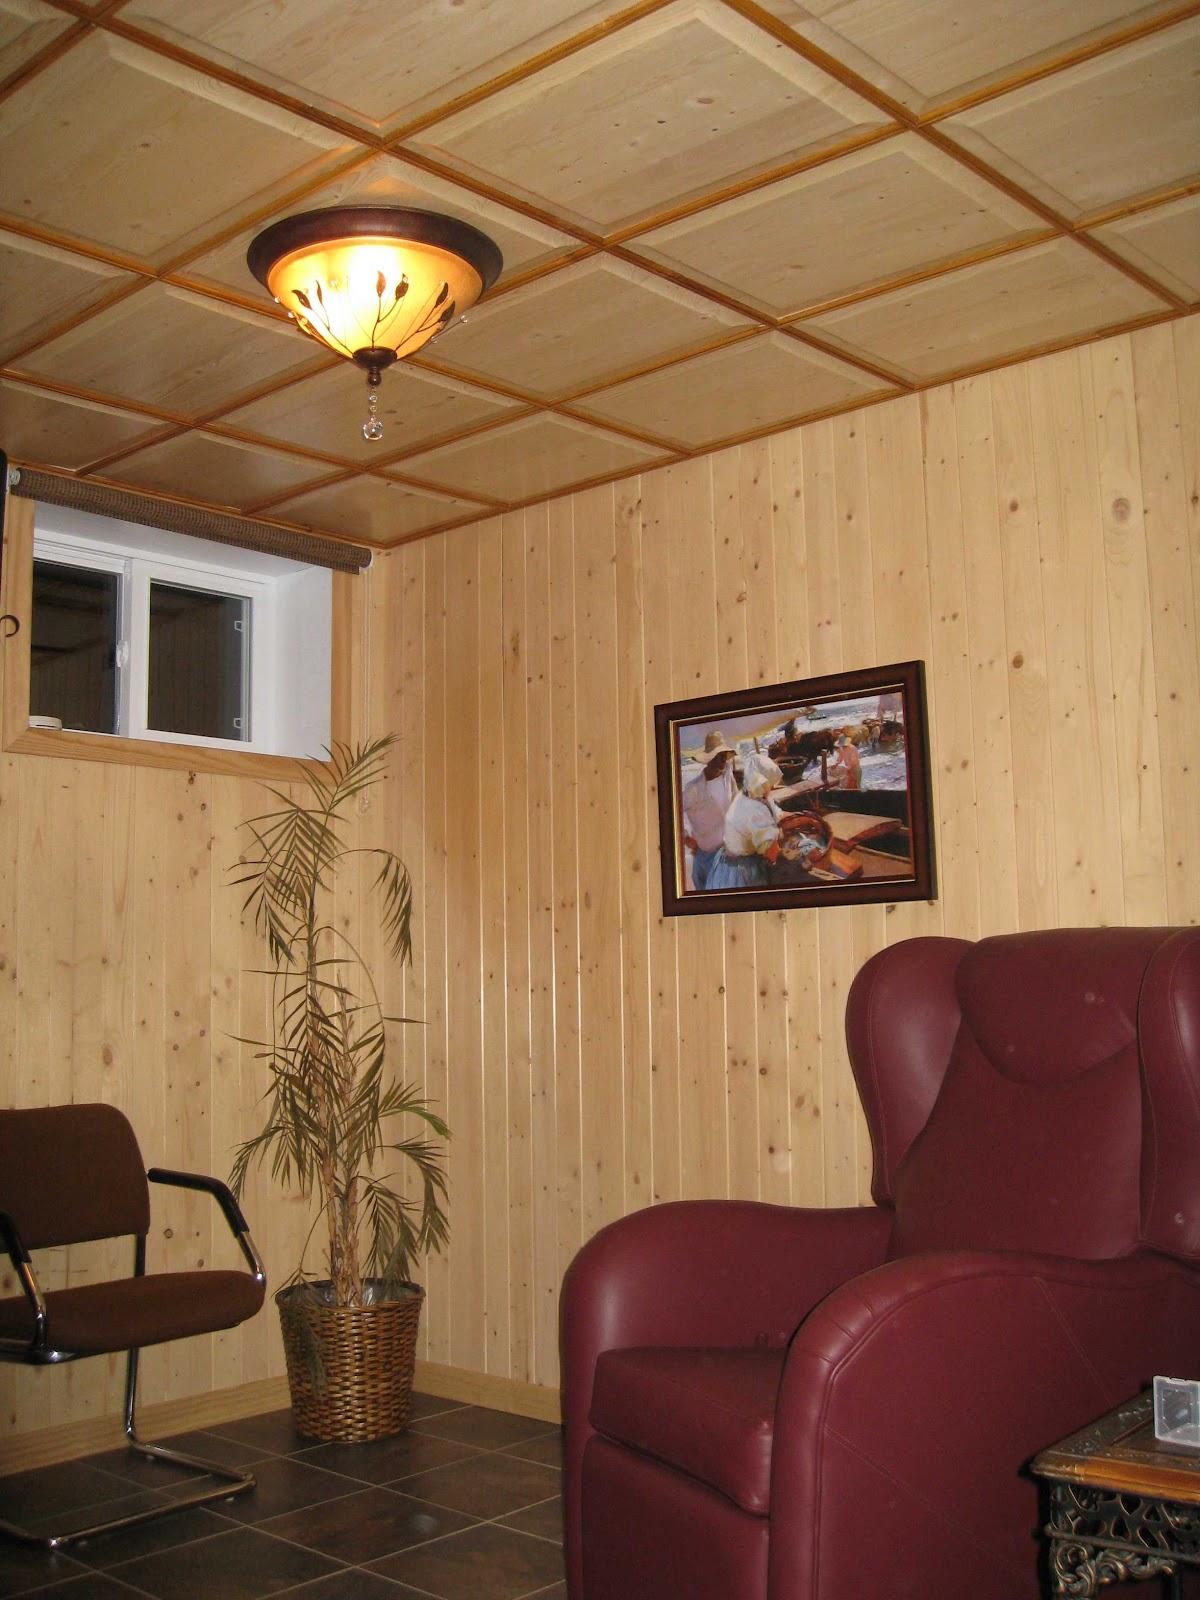 menuiserie st m thode plafond suspendu en bois On modele plafond suspendu